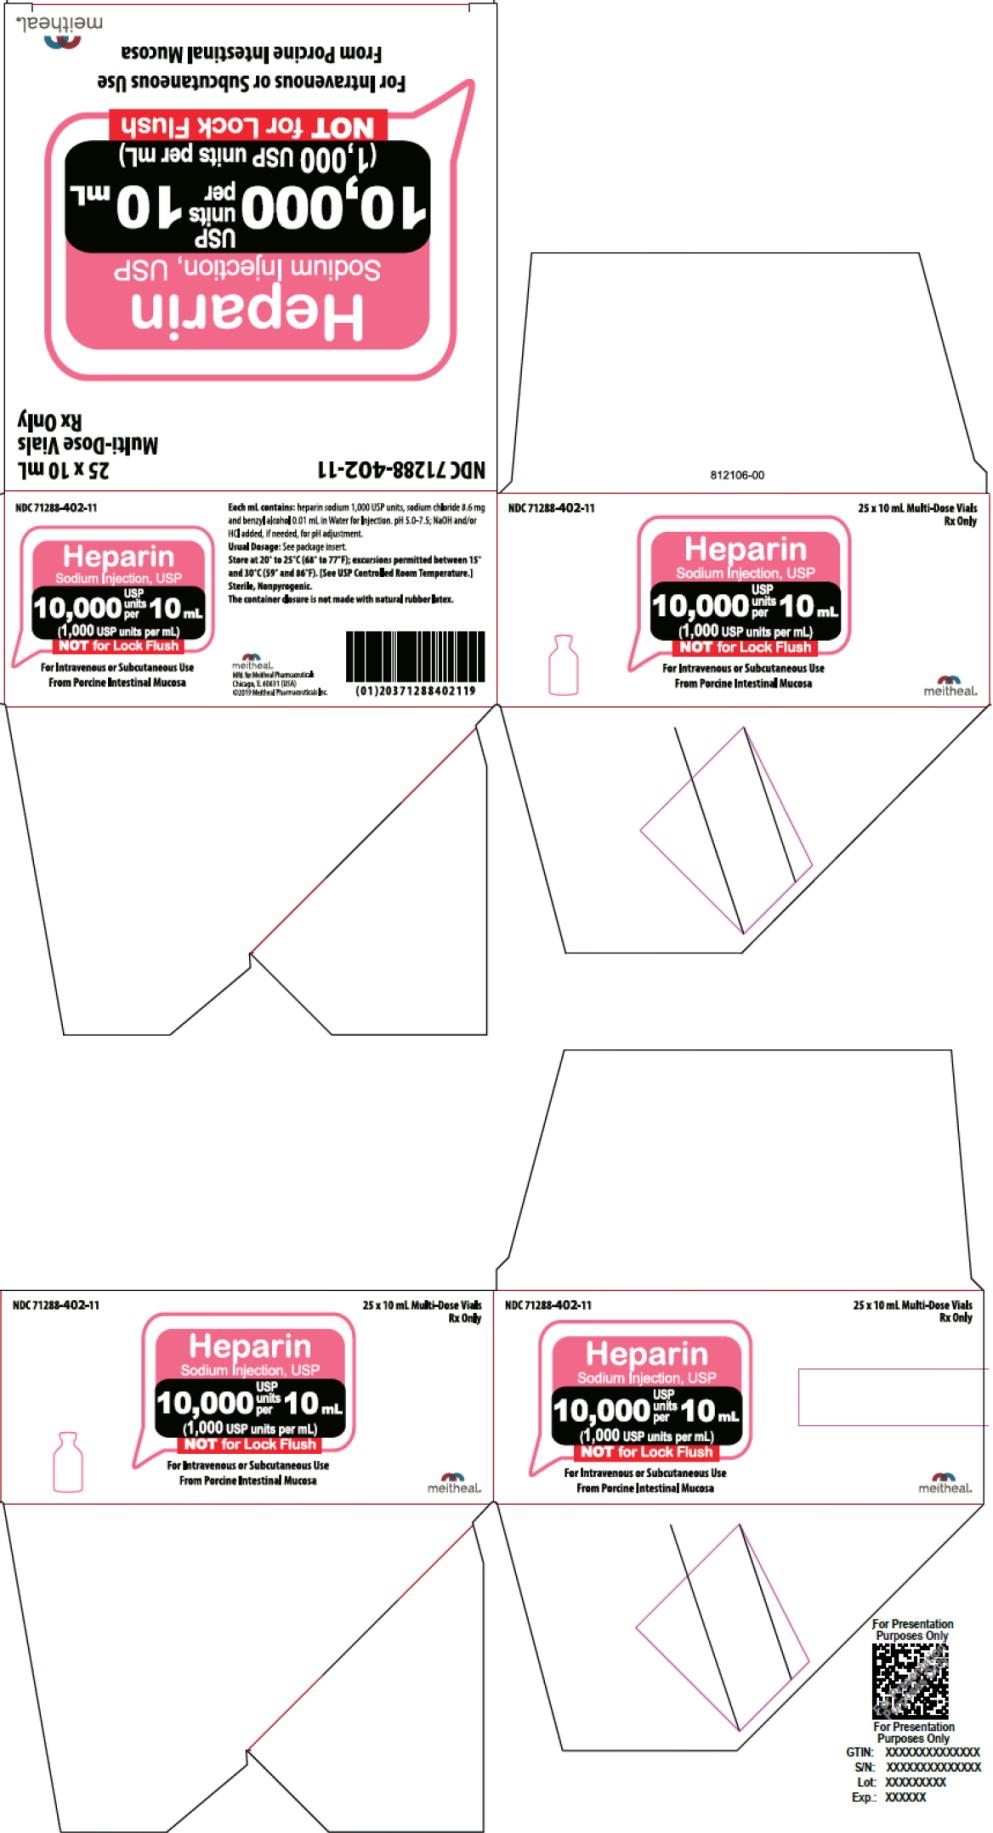 Principal Display Panel – Heparin Sodium Injection, USP 10,000 USP Carton